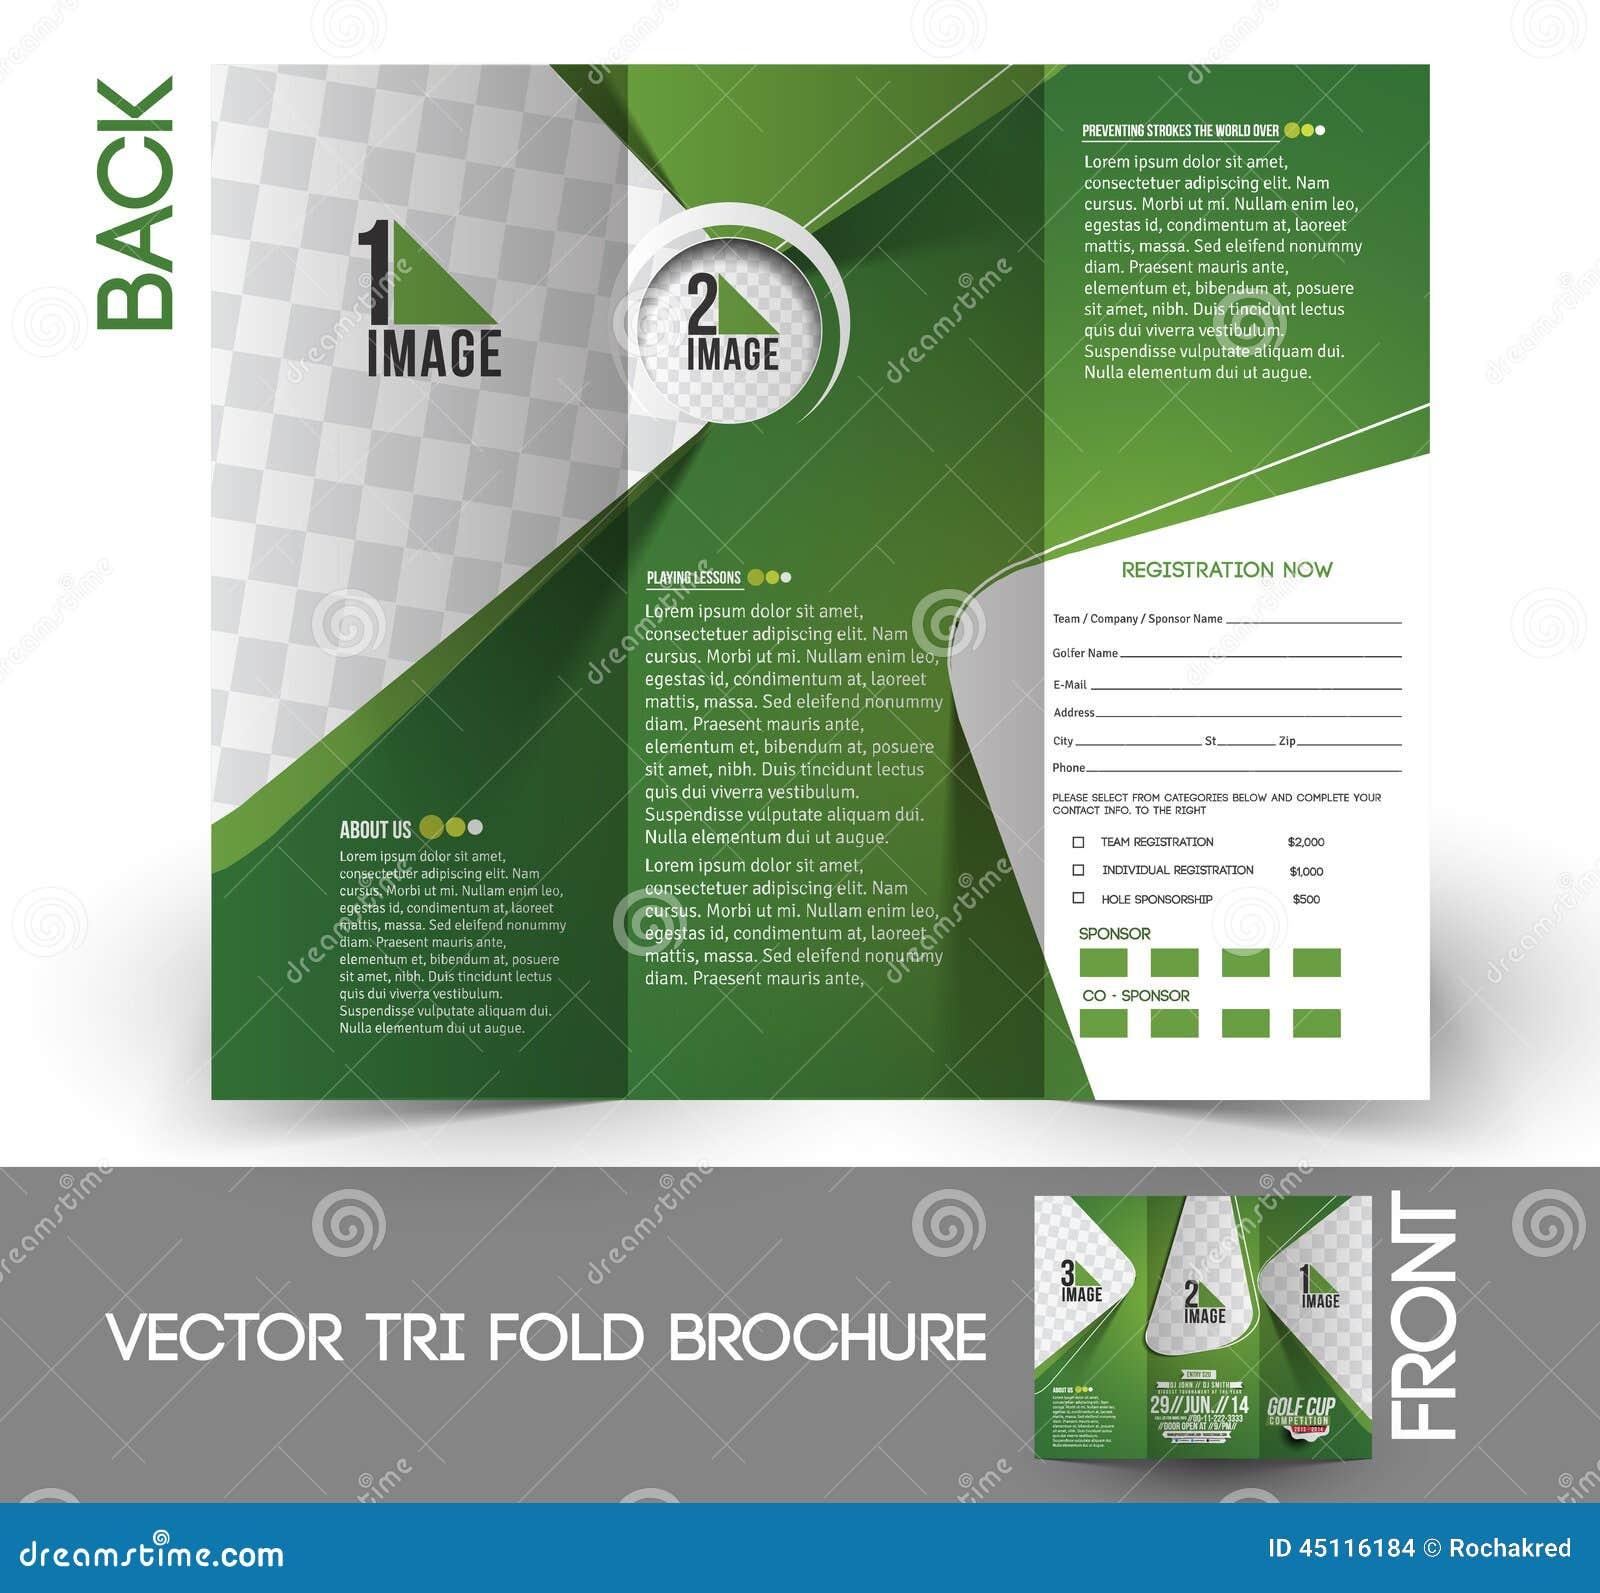 Golf Tournament Brochure Templates Pasoevolistco - Golf brochure template